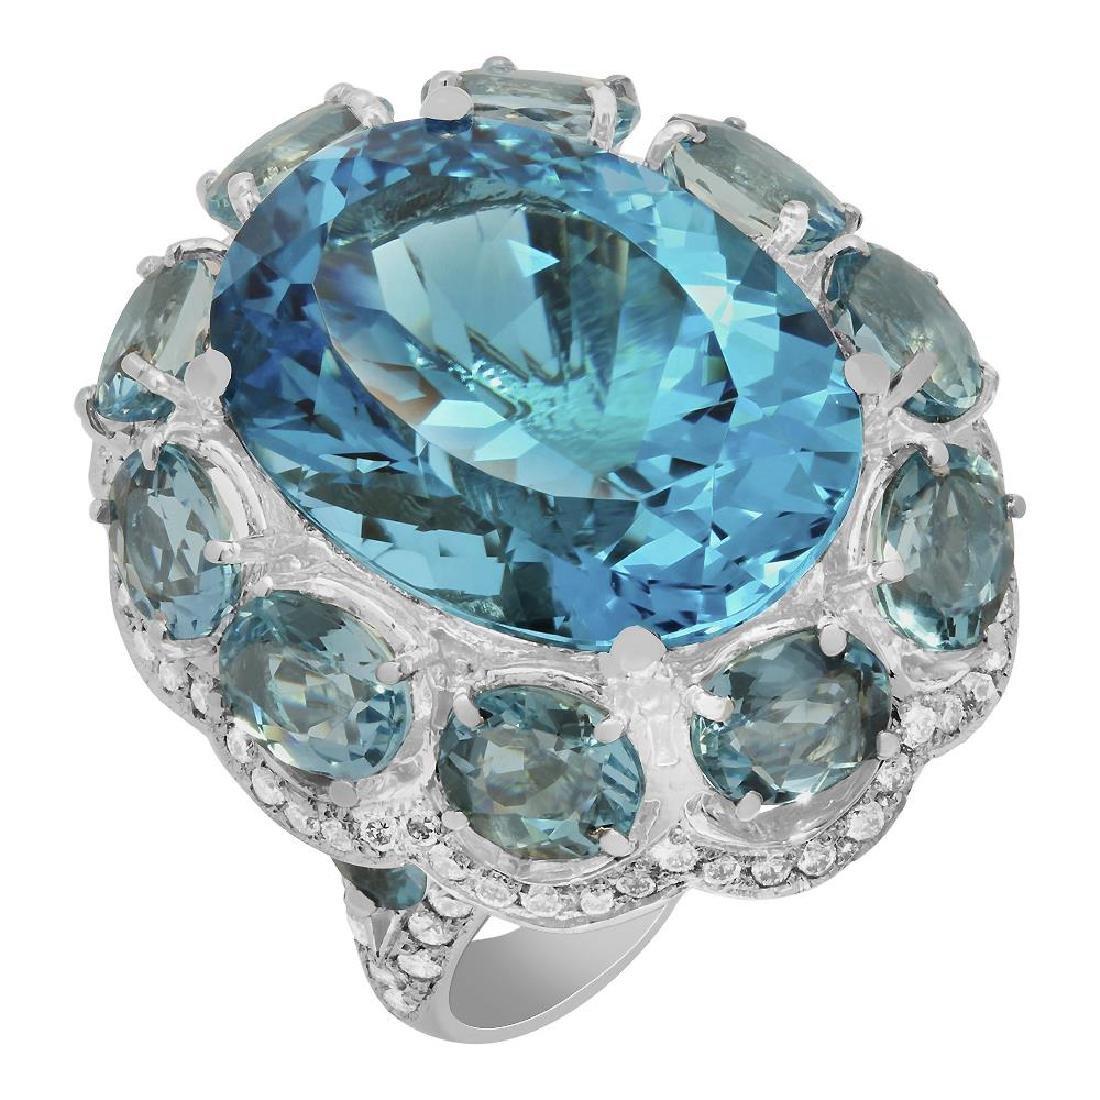 14k White Gold 25.62ct Blue Topaz 14.13ct Aquamarine